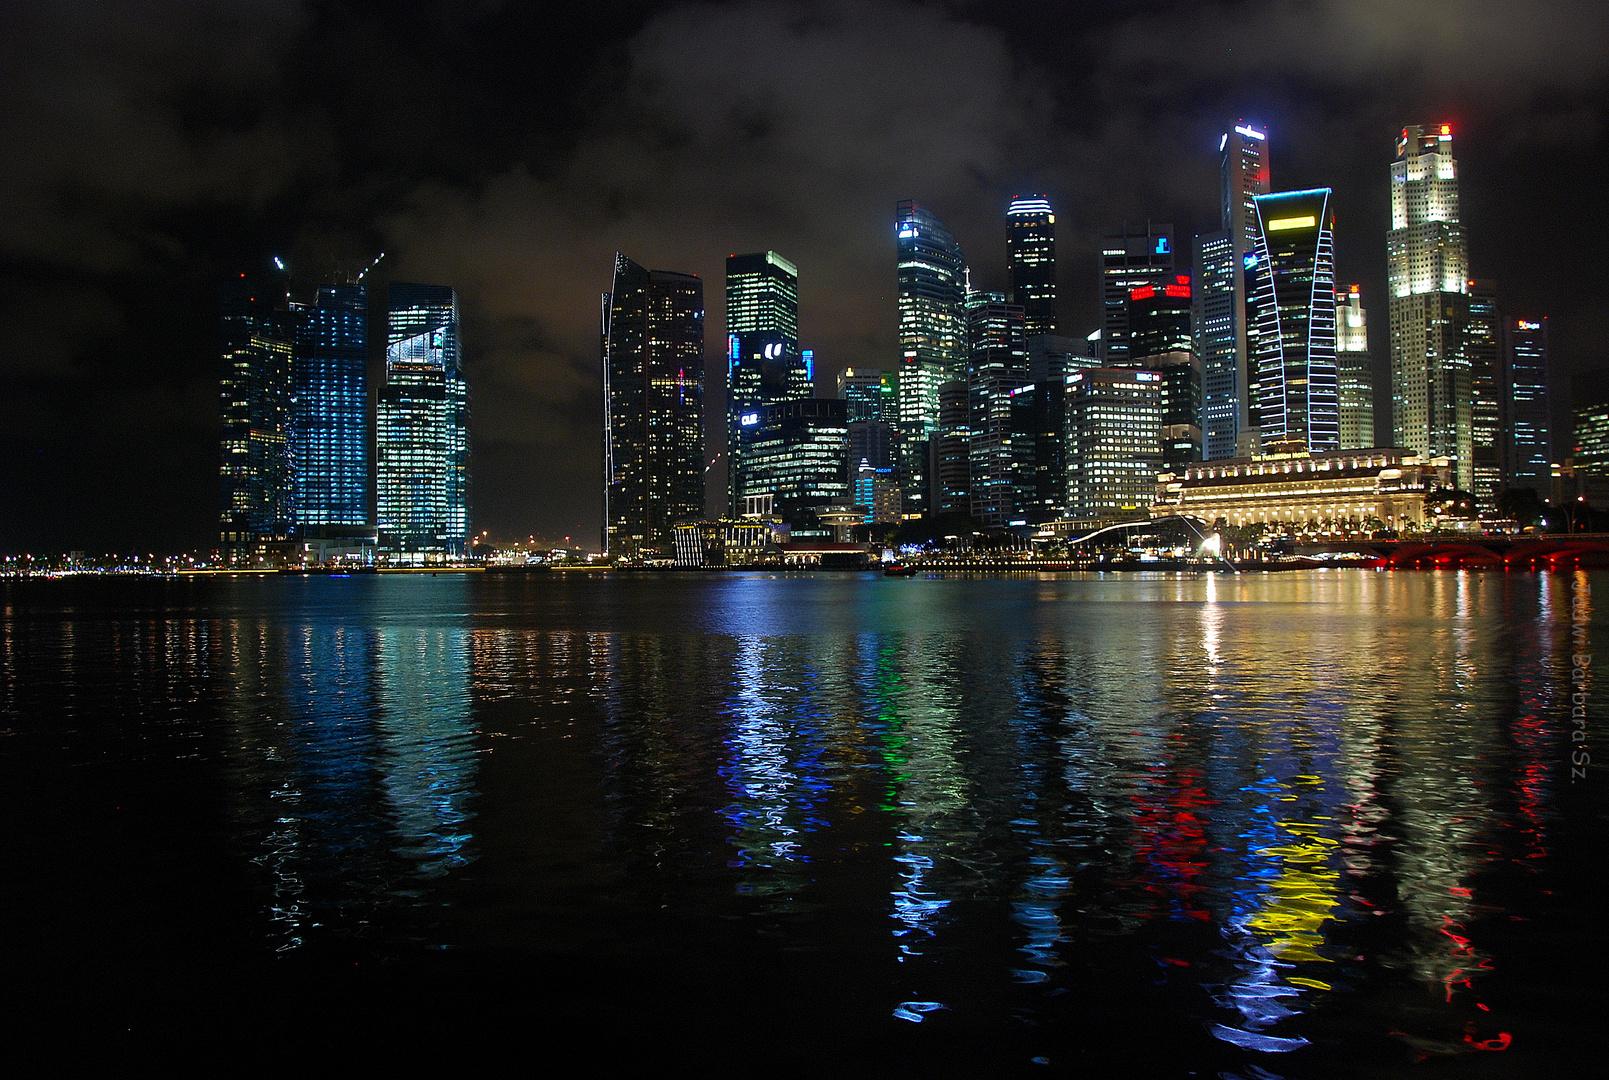 Singapore by night II